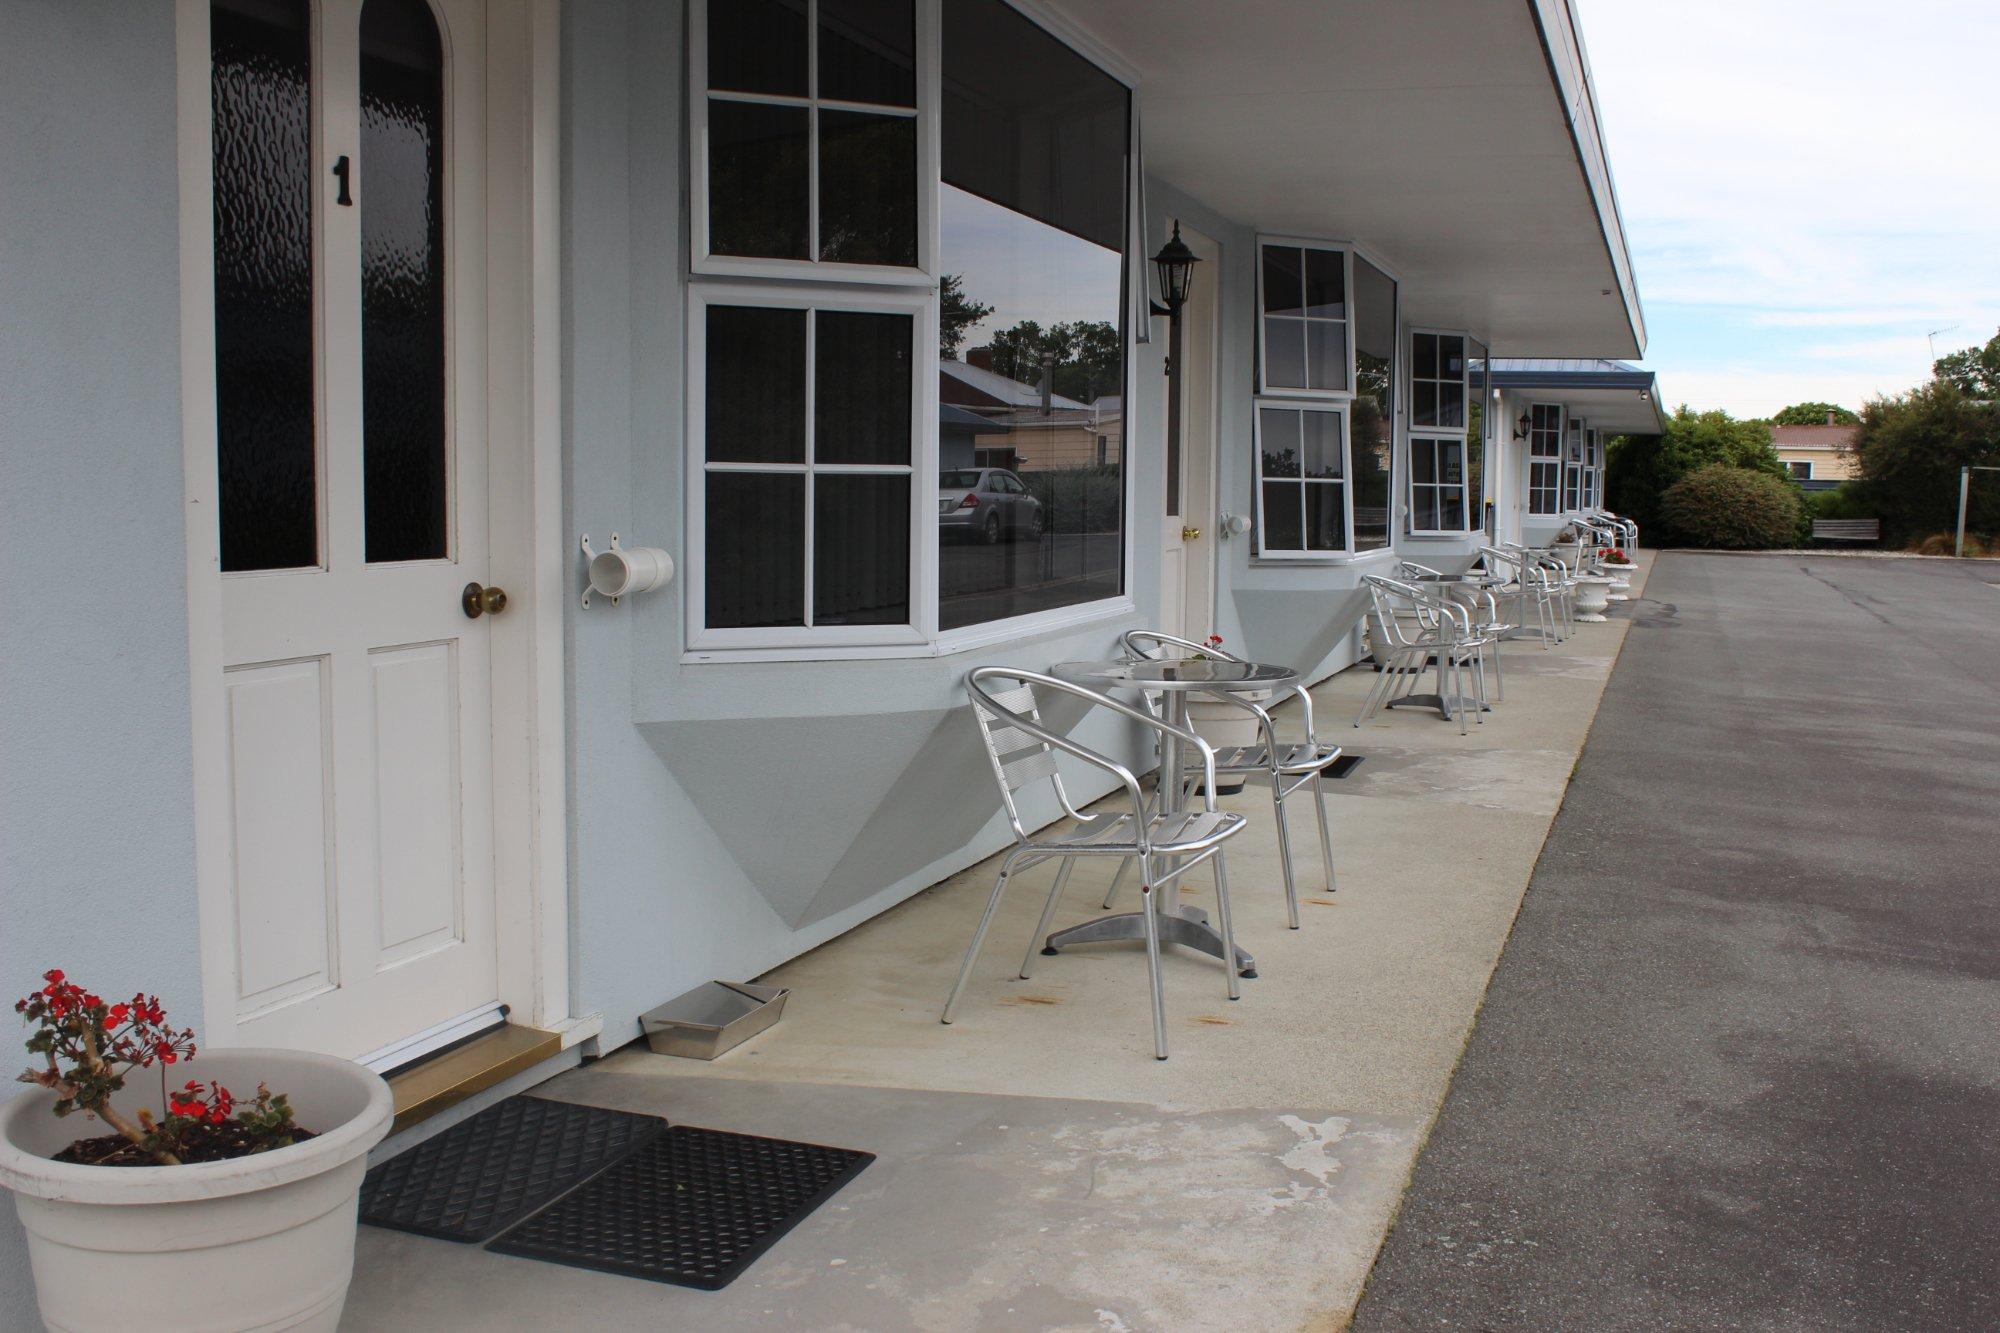 Riverlea Motel